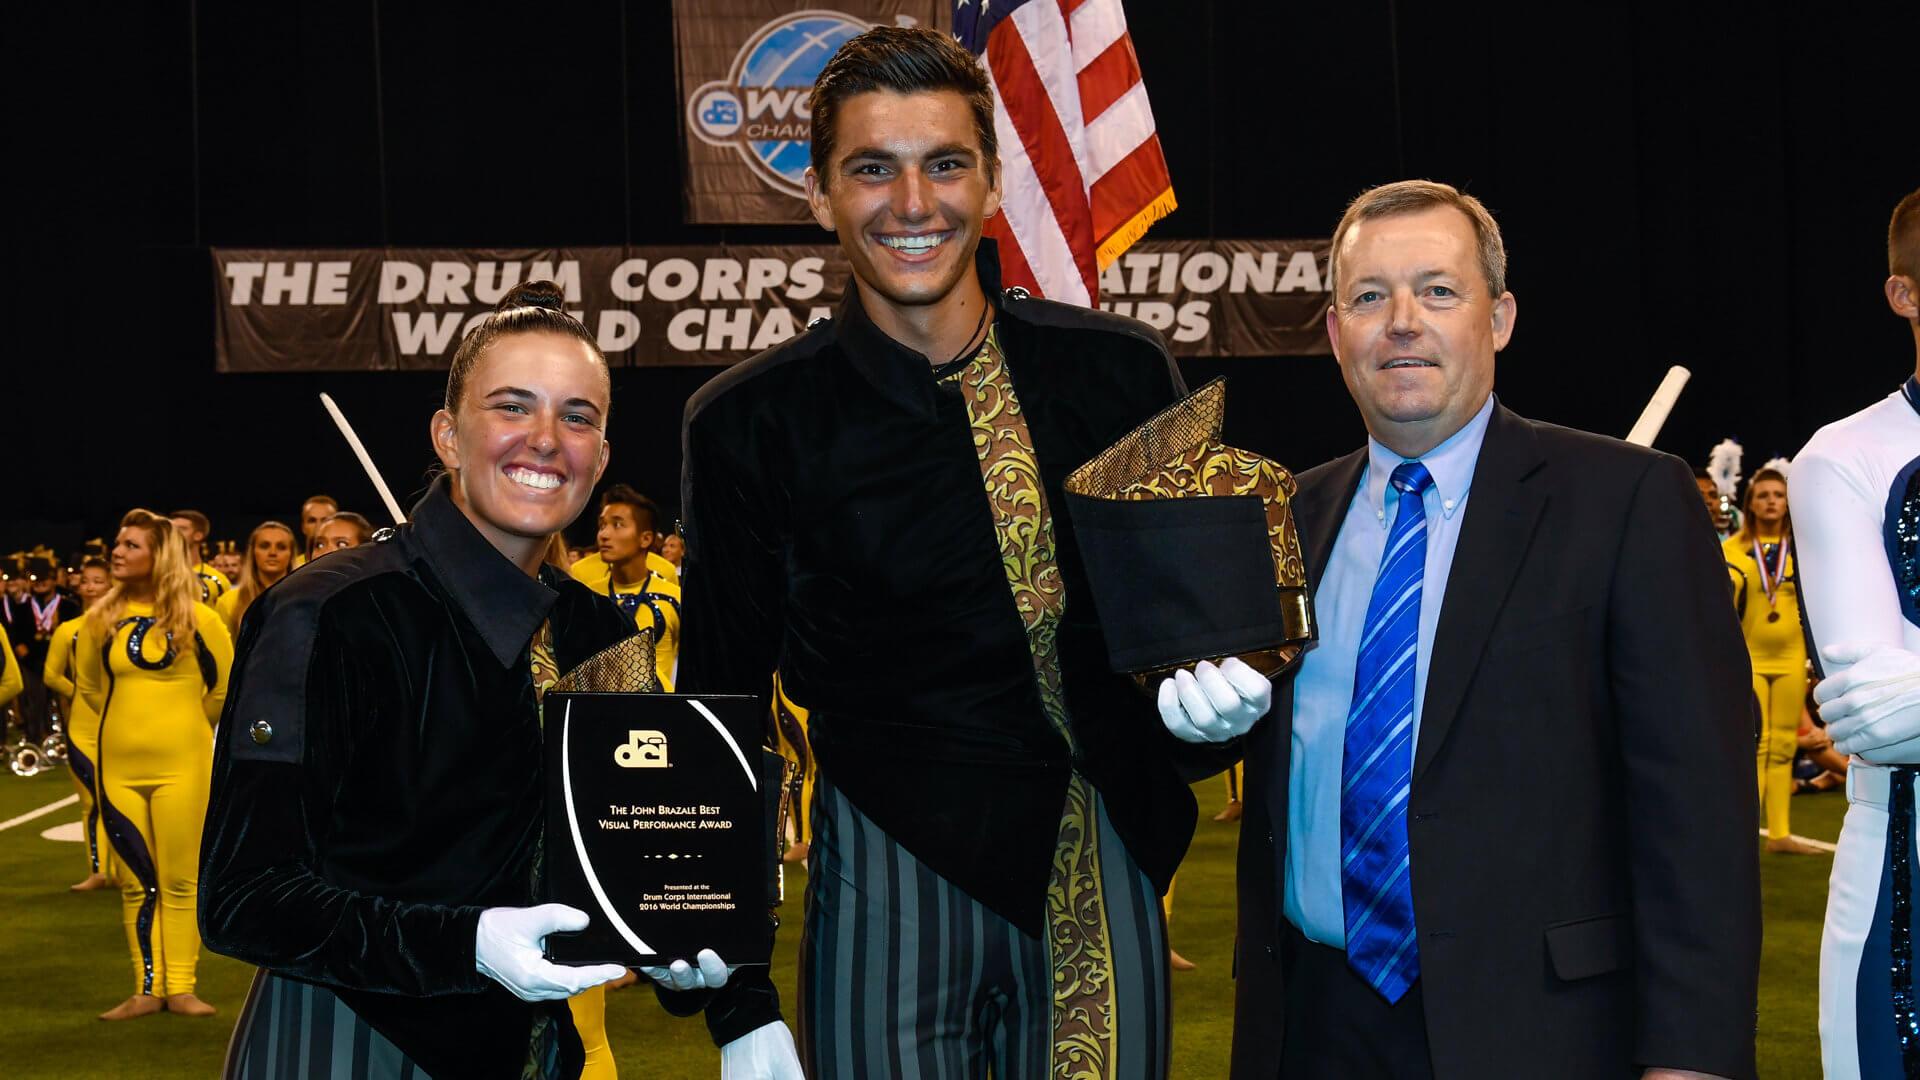 2016 DCI World Championship caption award winners